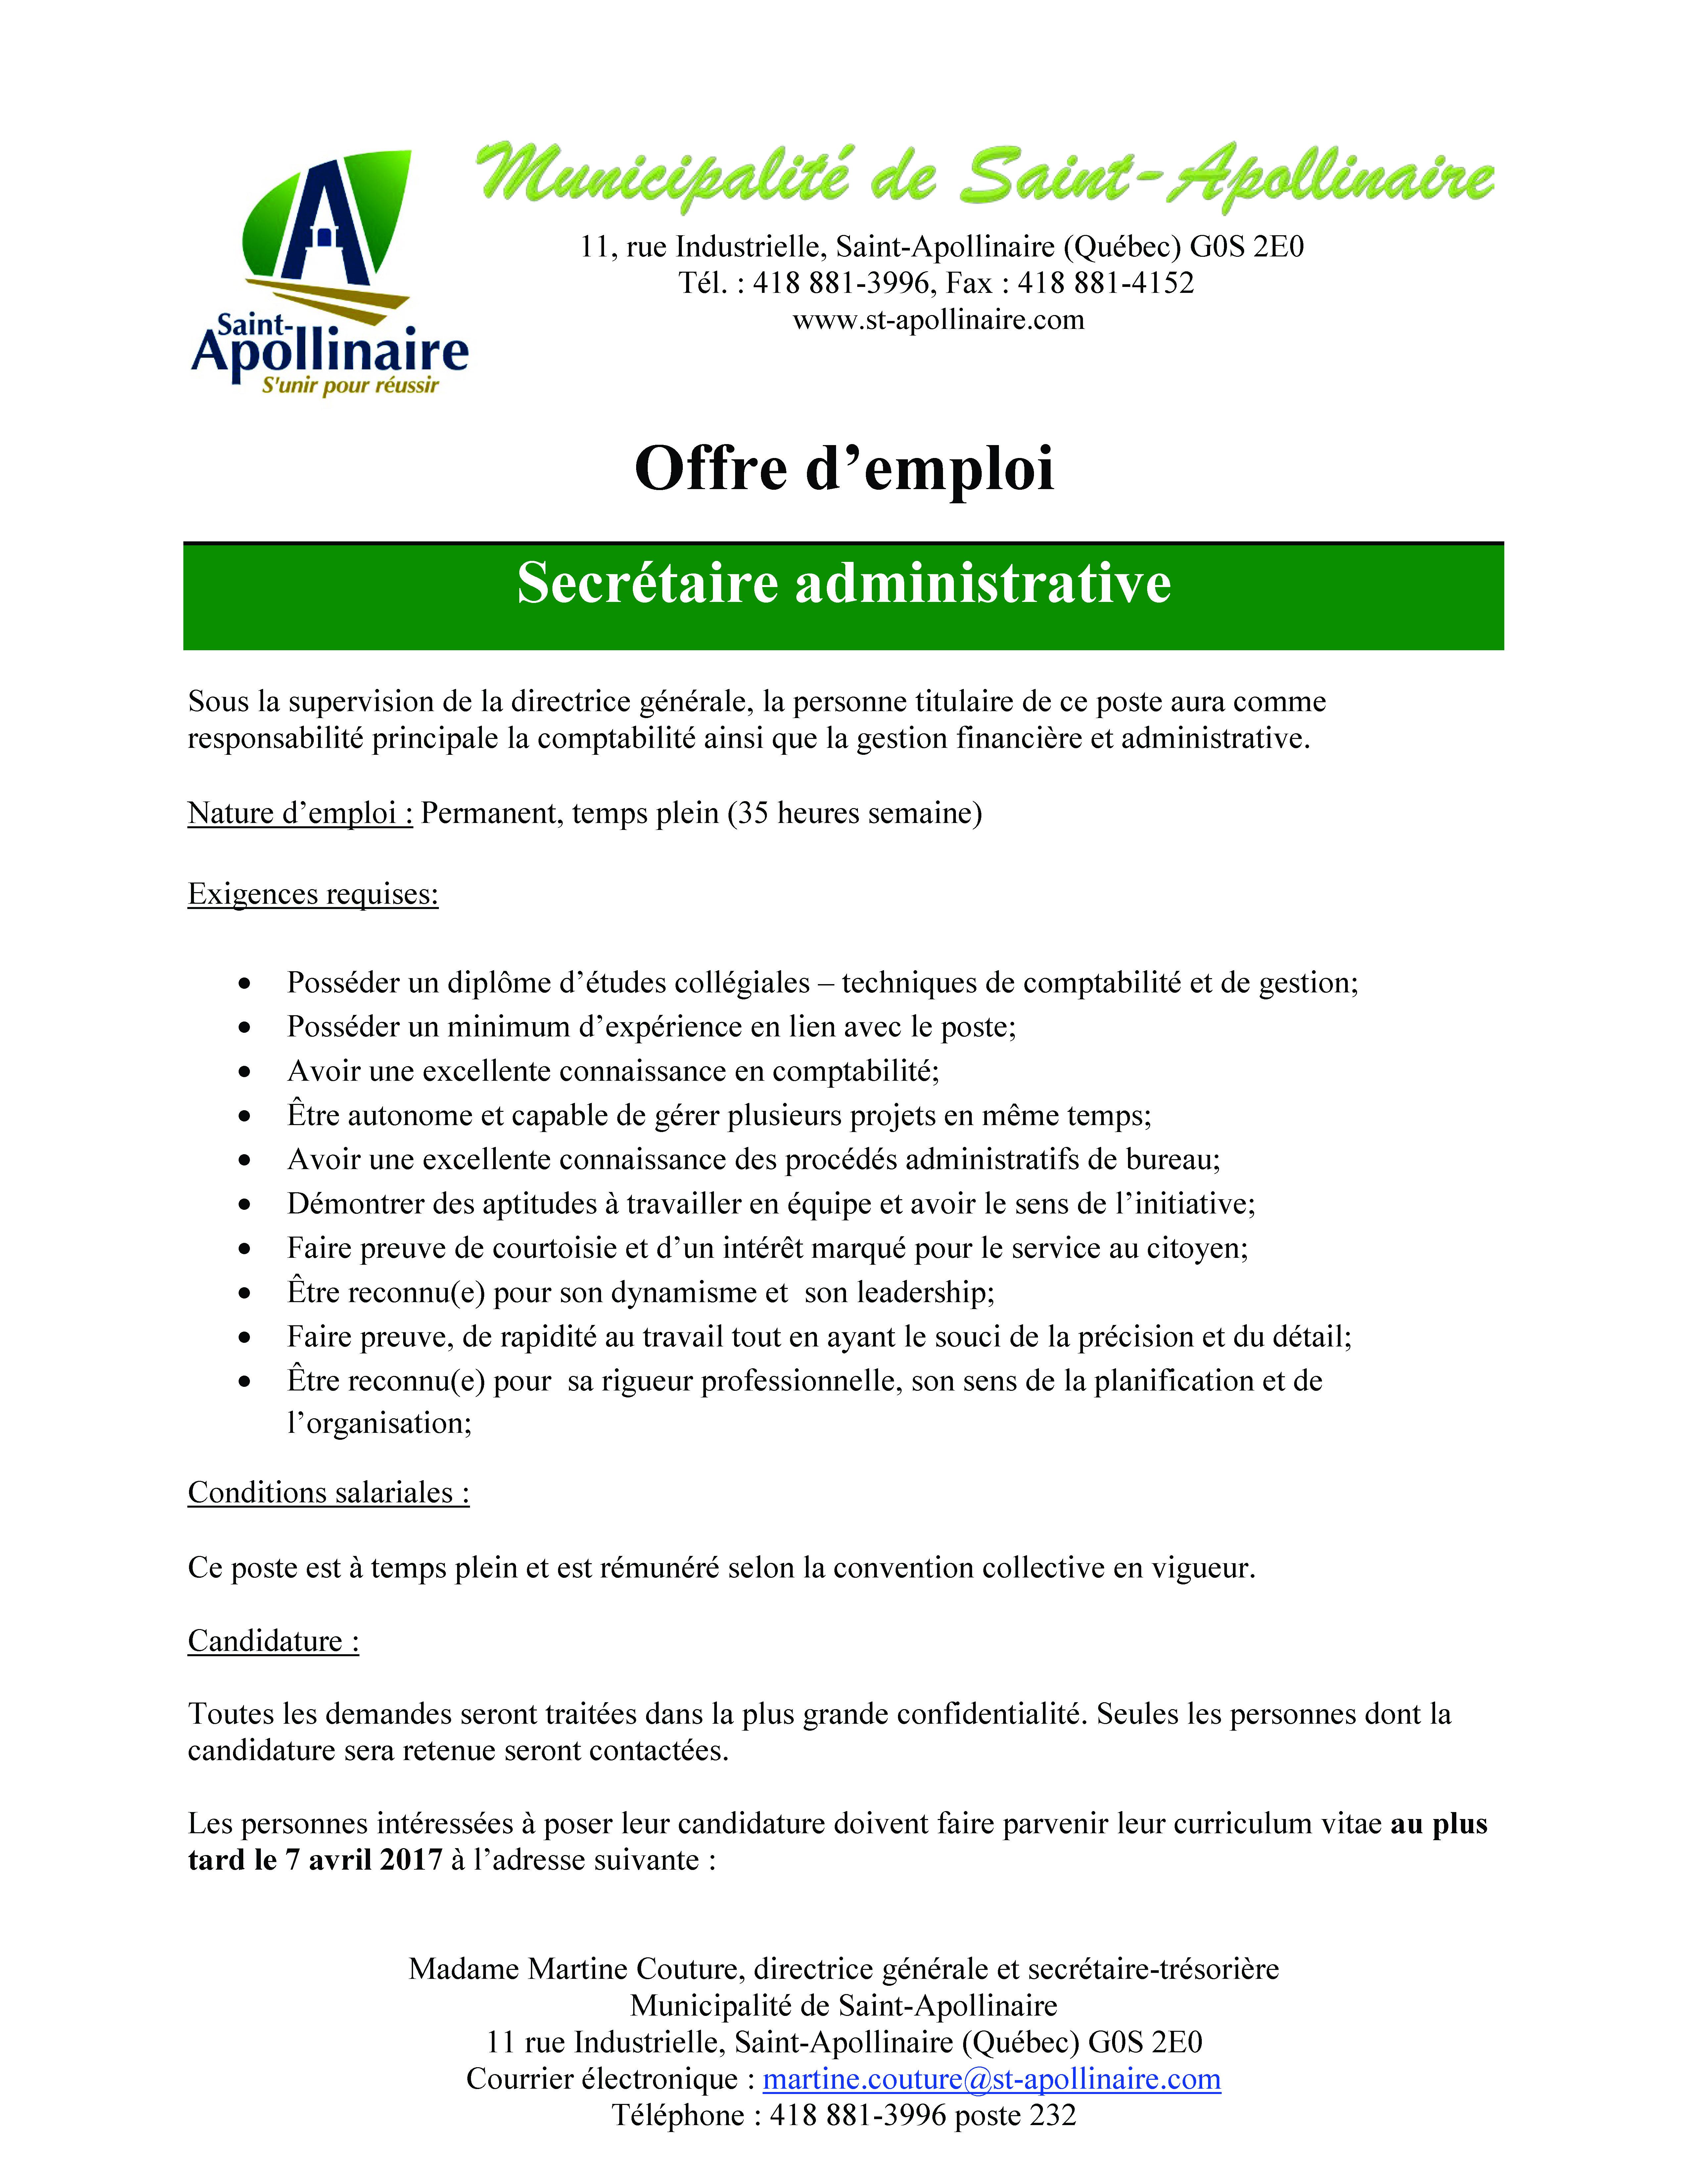 offre d emploi secr 233 taire administrative apollinaire